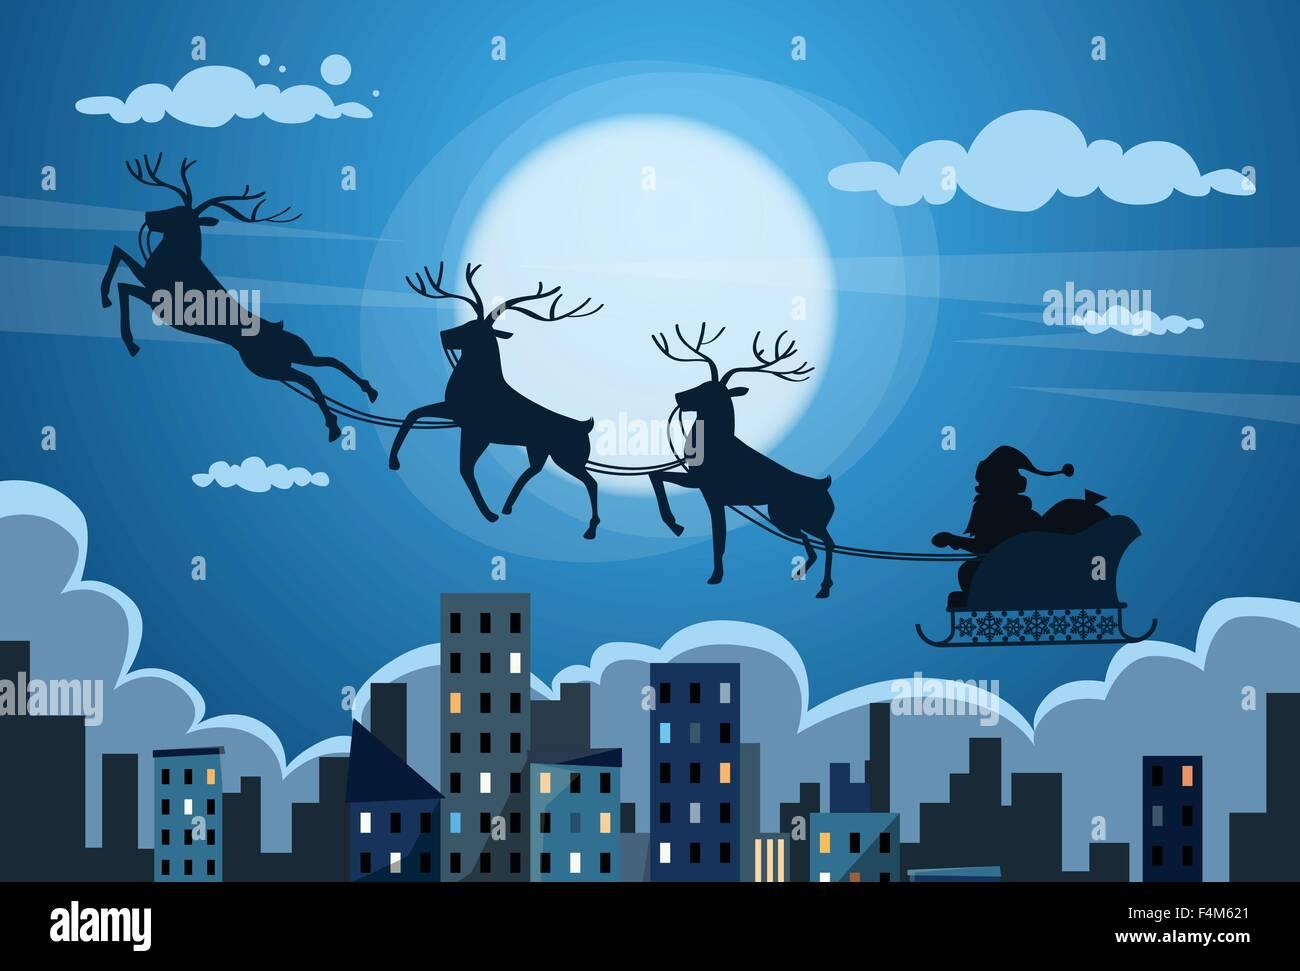 Santa Claus Sleigh Reindeer Fly Sky over City Skyscraper Night View Cityscape Snow Skyline Christmas New Year Card - Stock Image